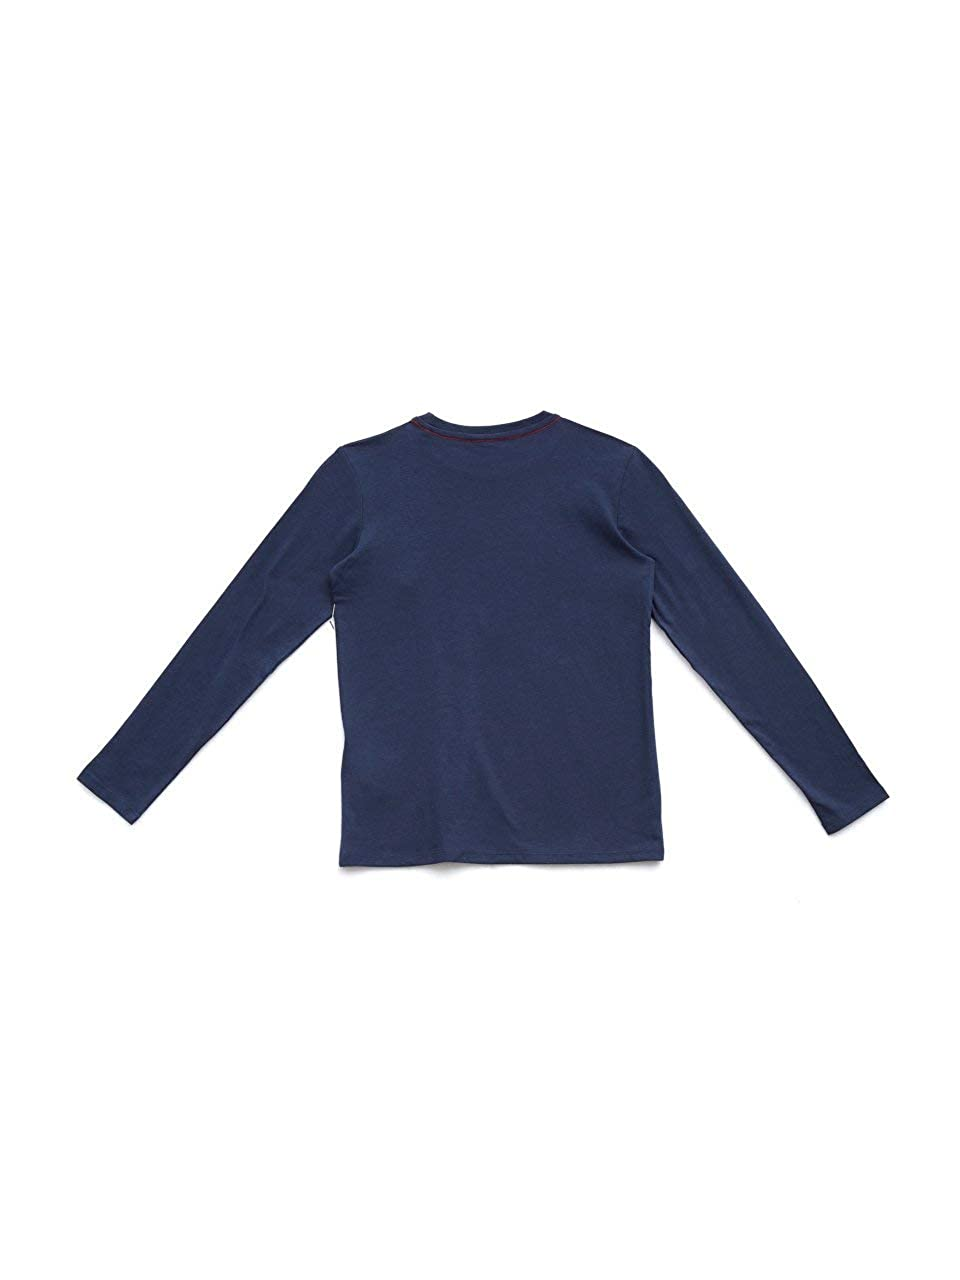 Guess T Shirt Manica Lunga Bambina Blu